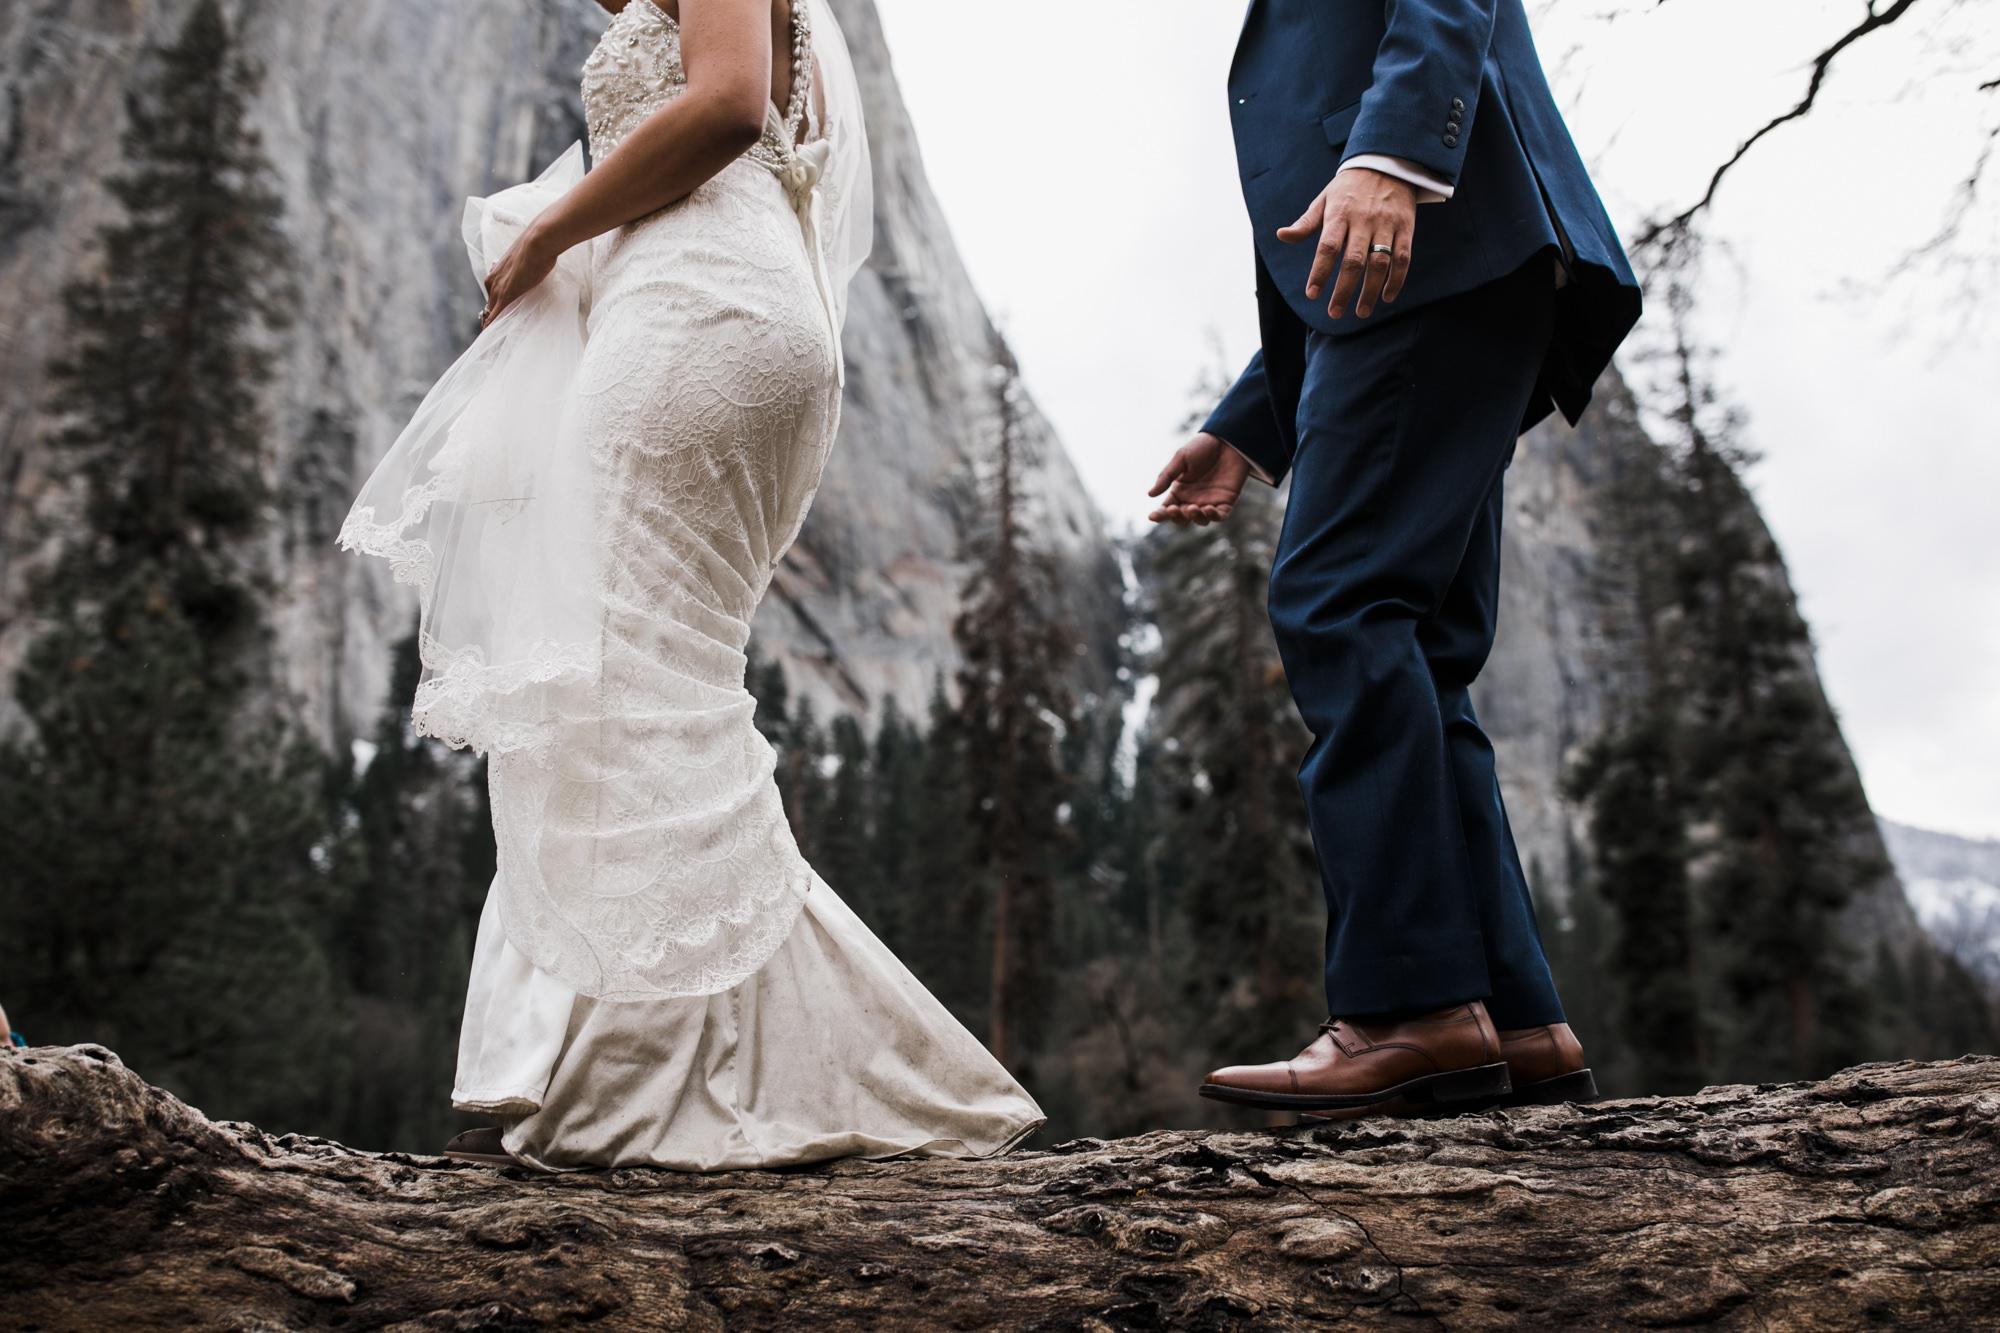 adventurous bride and groom in yosemite national park